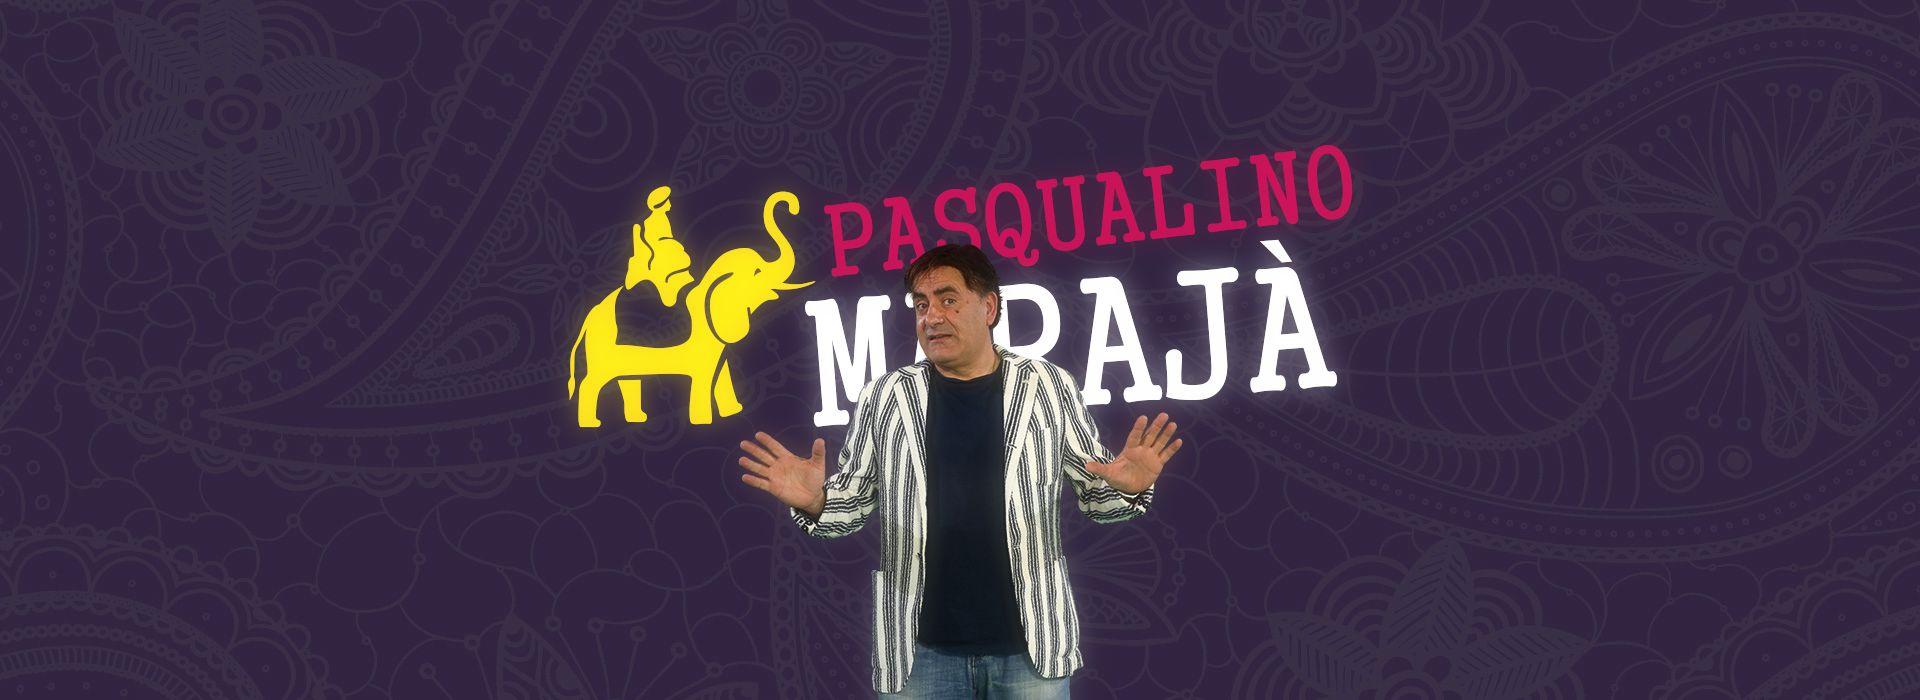 Pasqualino Maraja